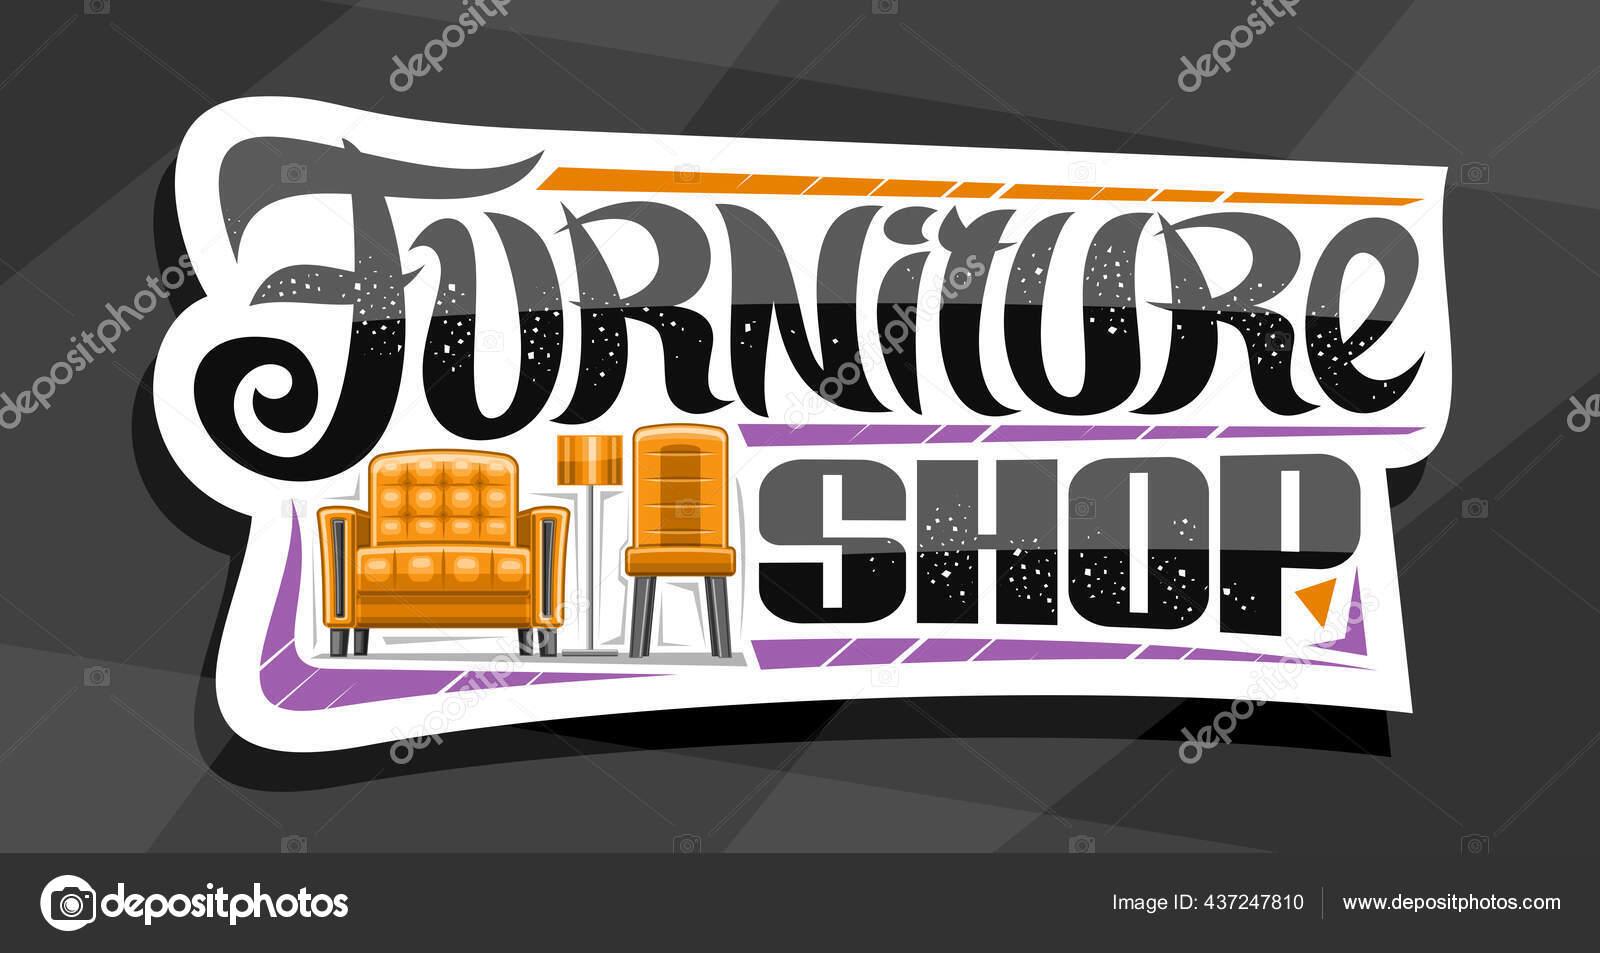 https fr depositphotos com 437247810 stock illustration vector logo furniture shop white html